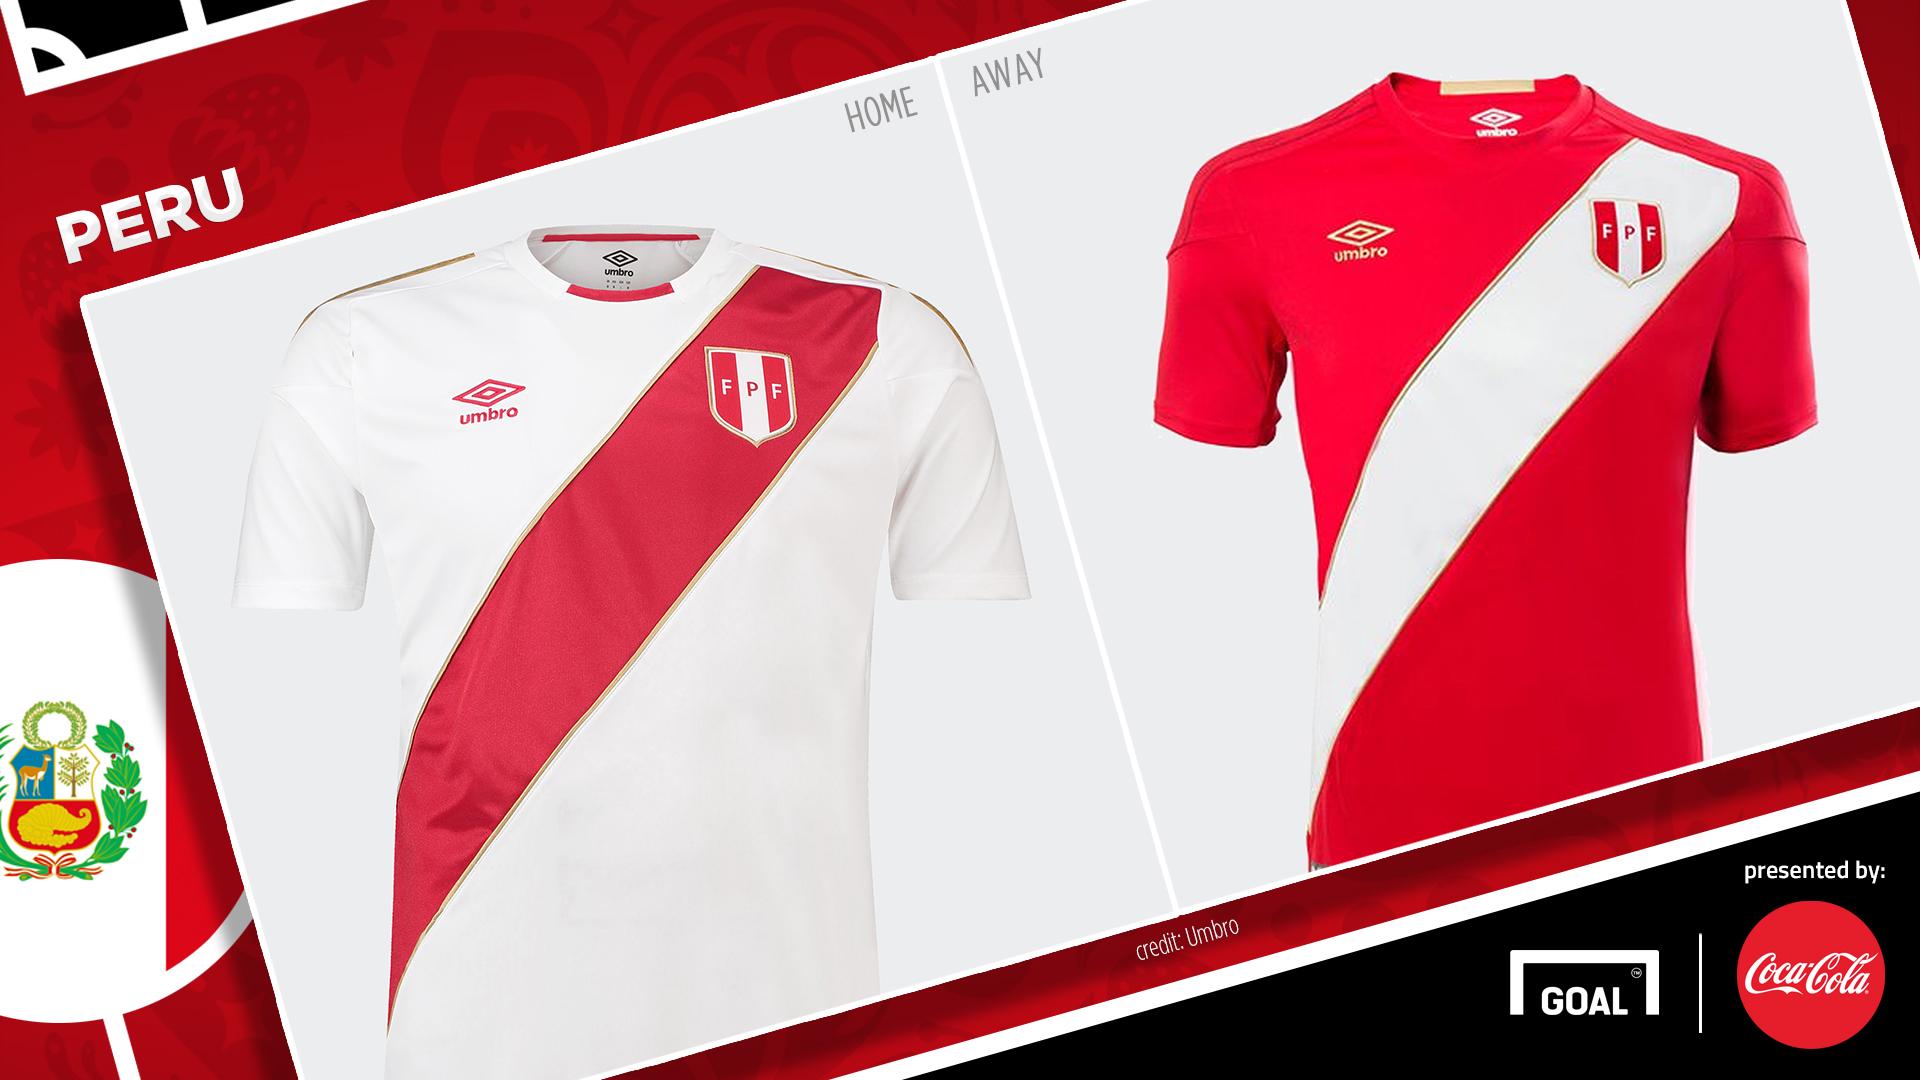 Coca-Cola Jersey Piala Dunia 2018 - Peru